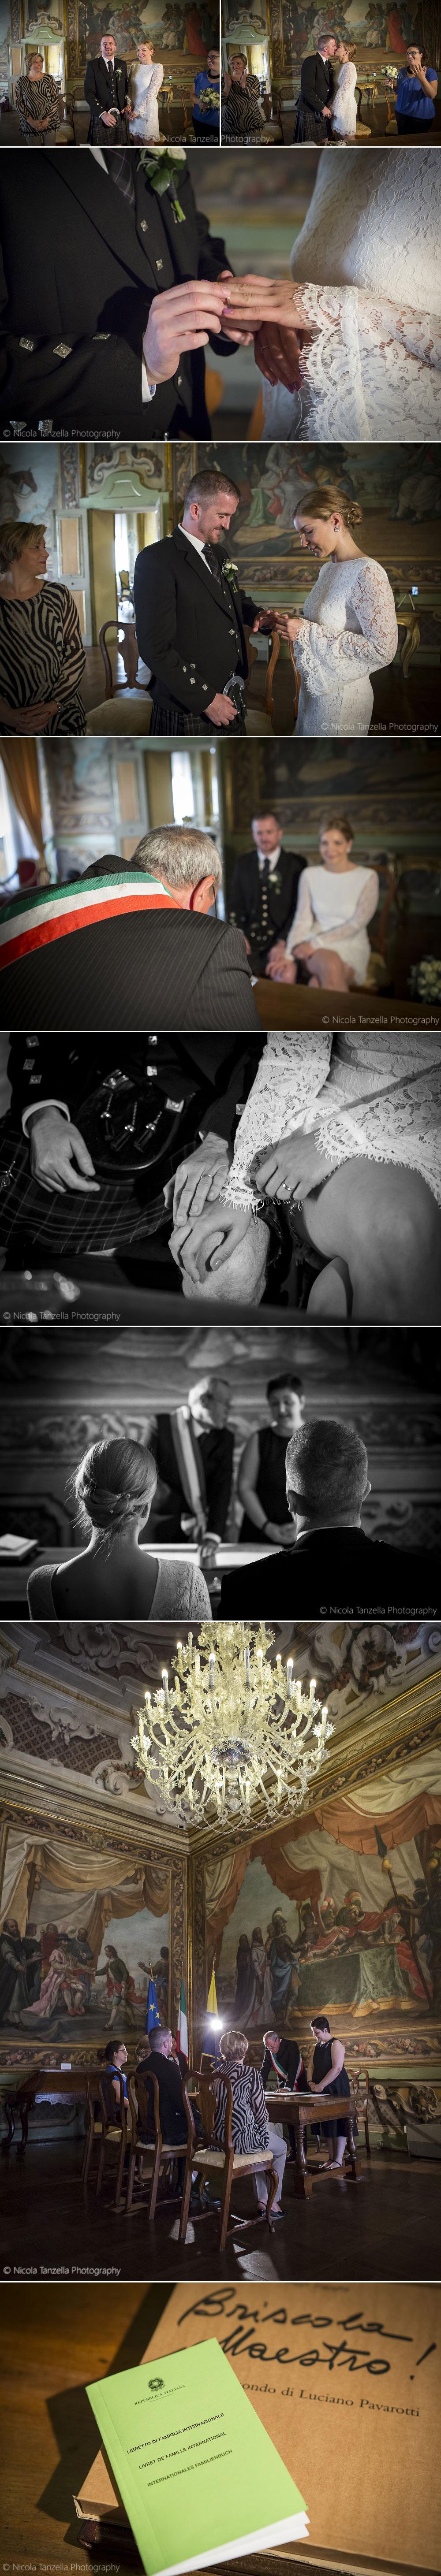 fotografo matrimonio modena-7